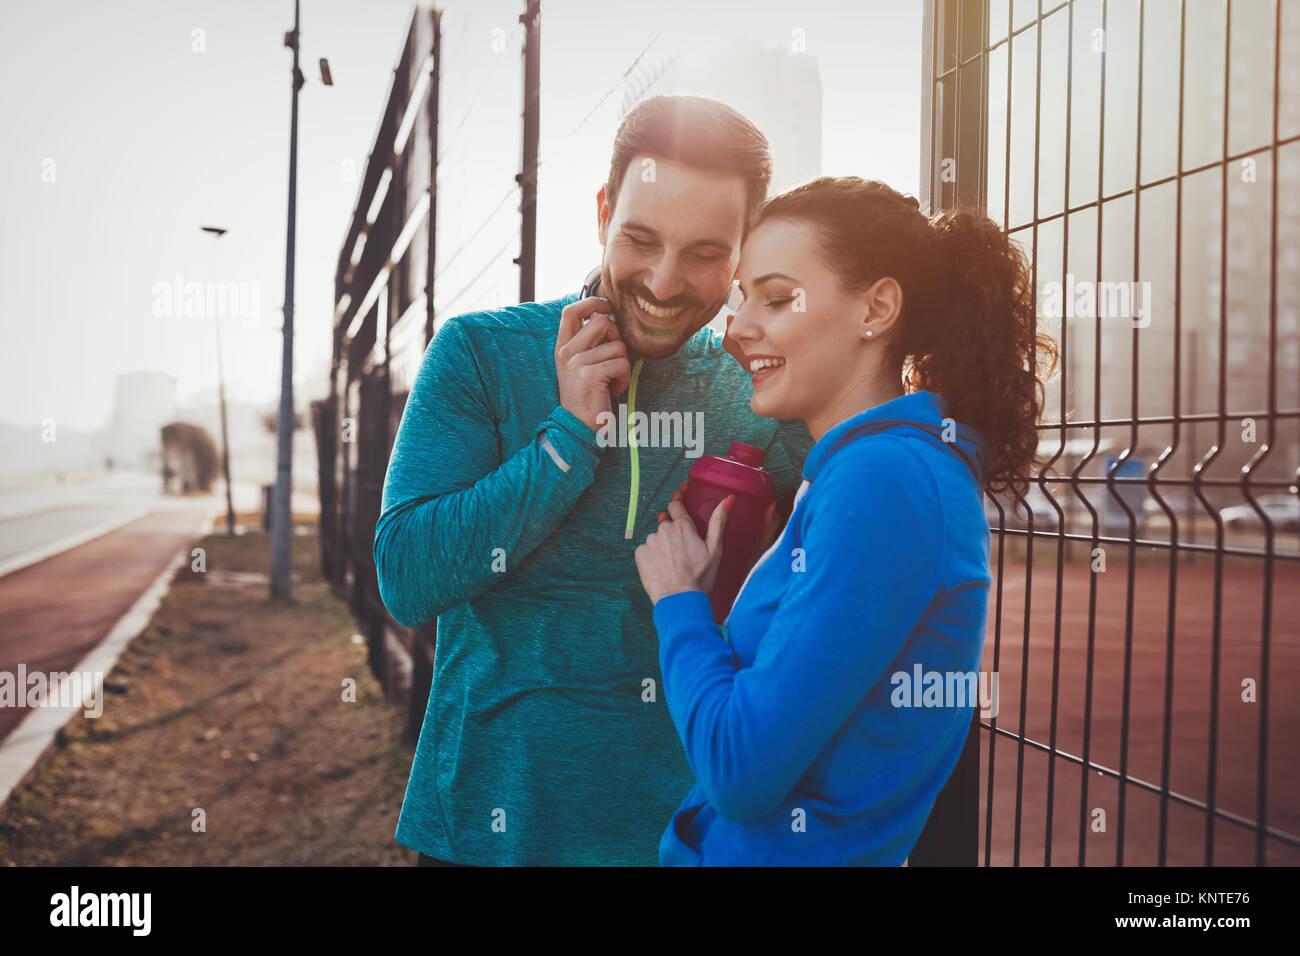 Sportivo e sportive flirtare outdoor dopo exercis fitness Foto Stock